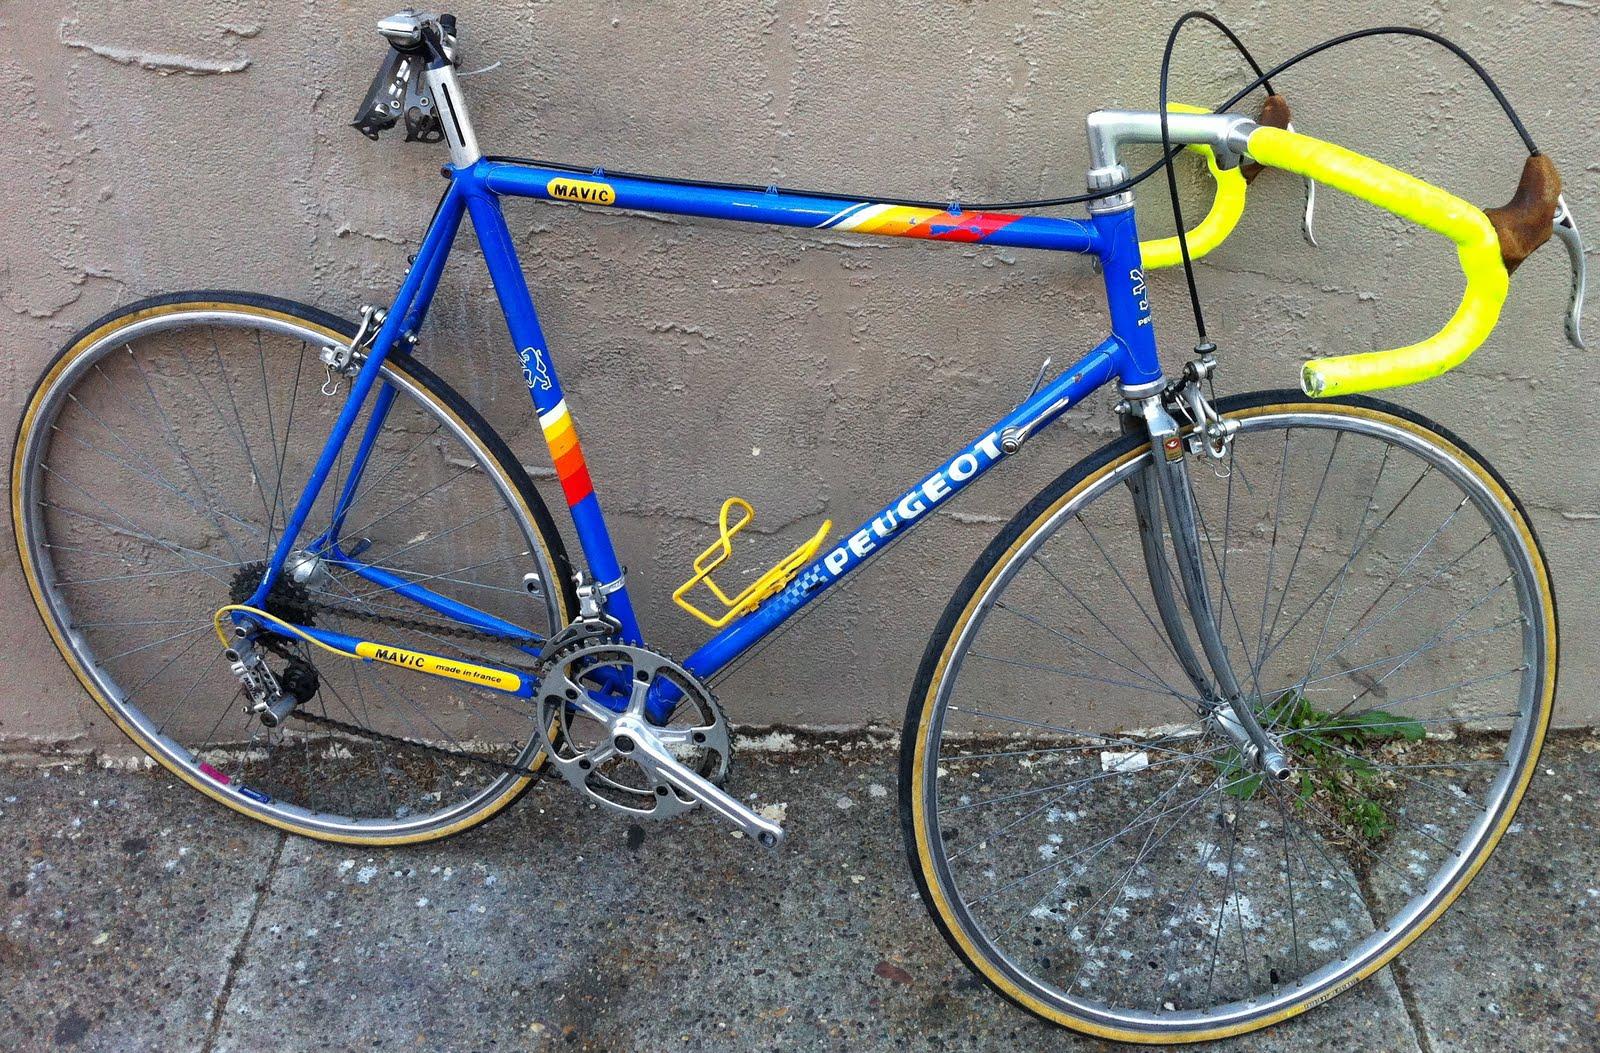 peugeot 1980s bikeville thoughts mavic